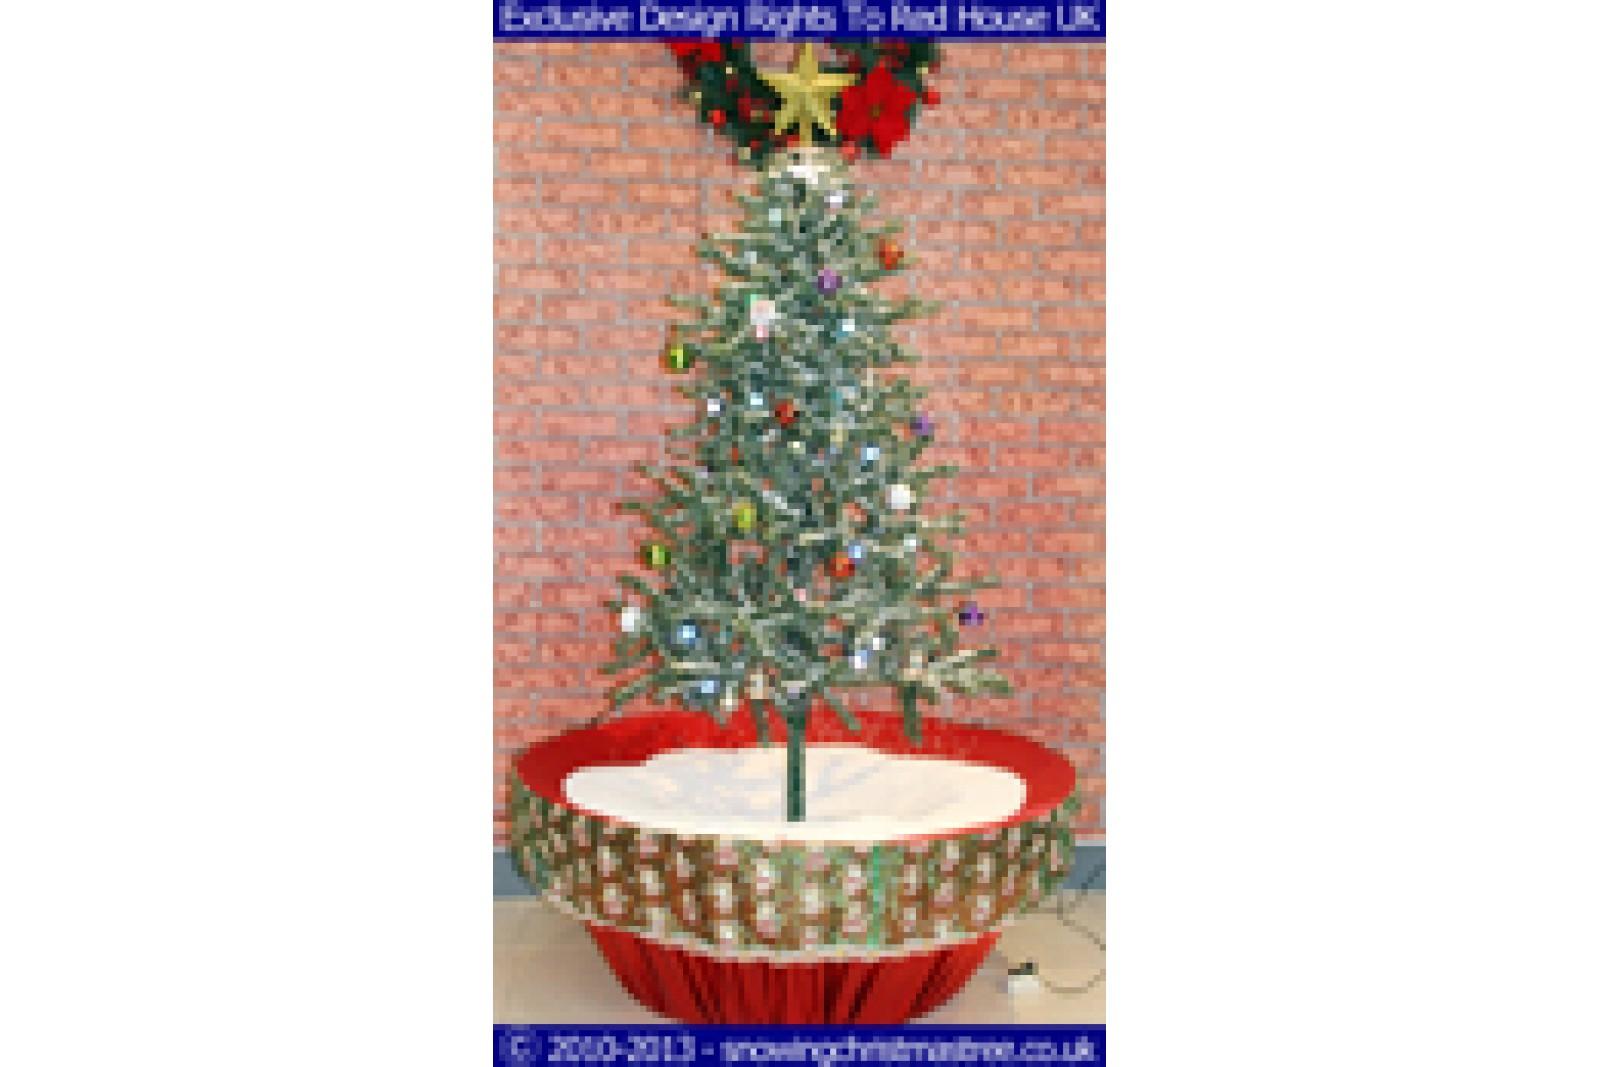 Umbrella Christmas Tree Uk.Snowing Christmas Tree With Red Umbrella Base Snow Falling Christmas Tree With Christmas Decorations Artificial Snowing Christmas Tree Snow